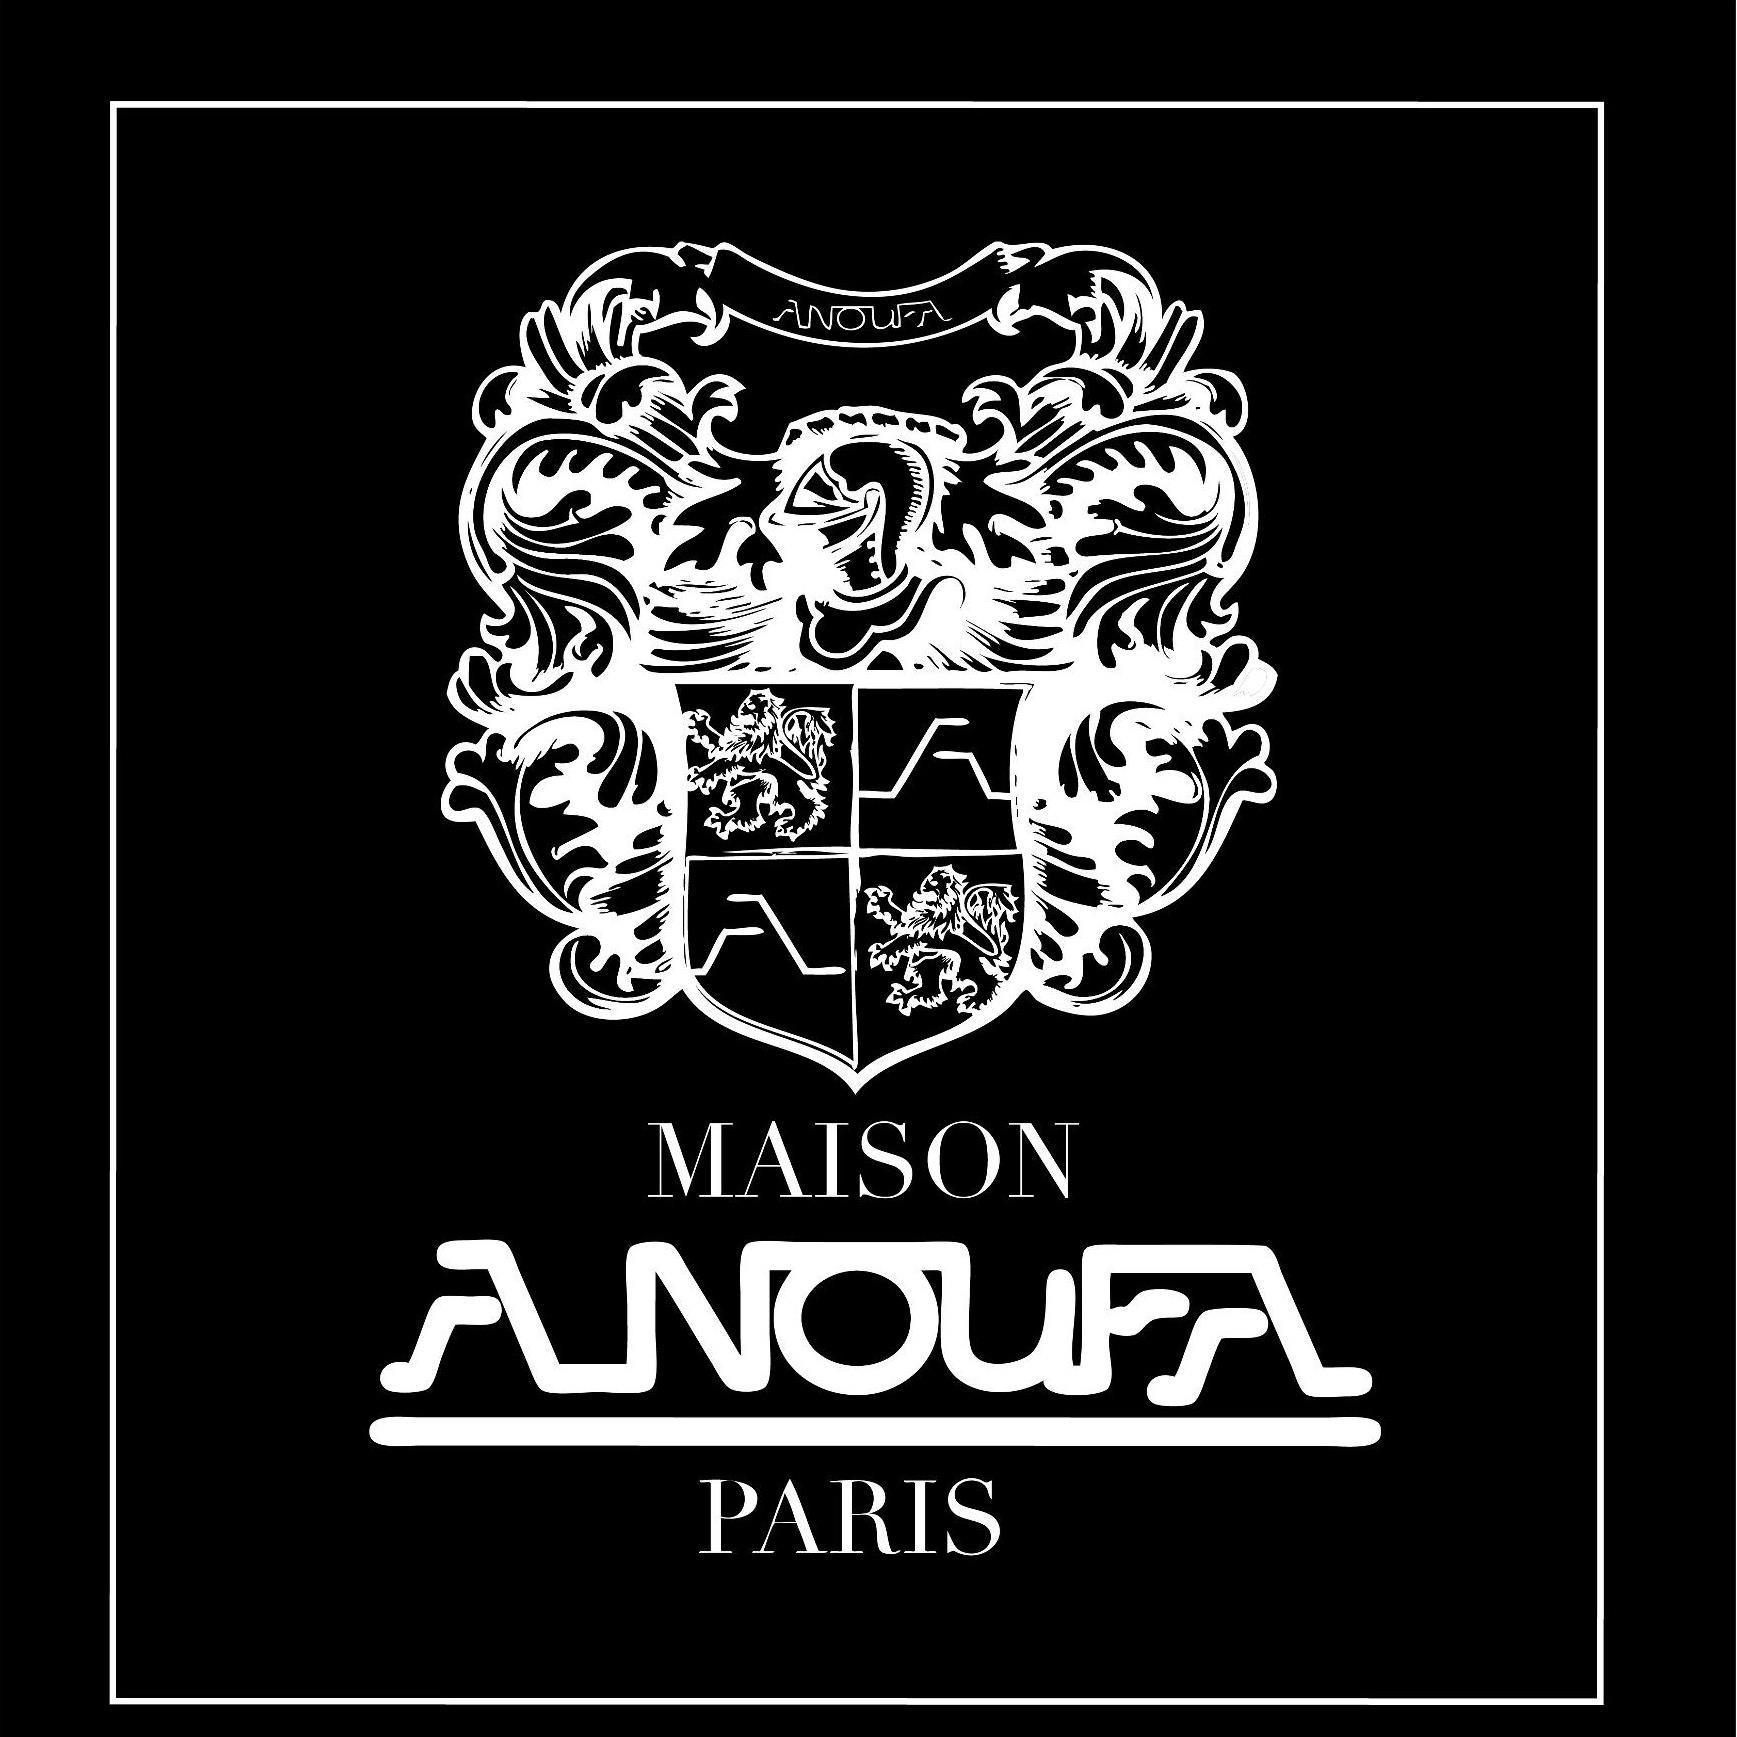 Pokaz mody Maison Anoufa